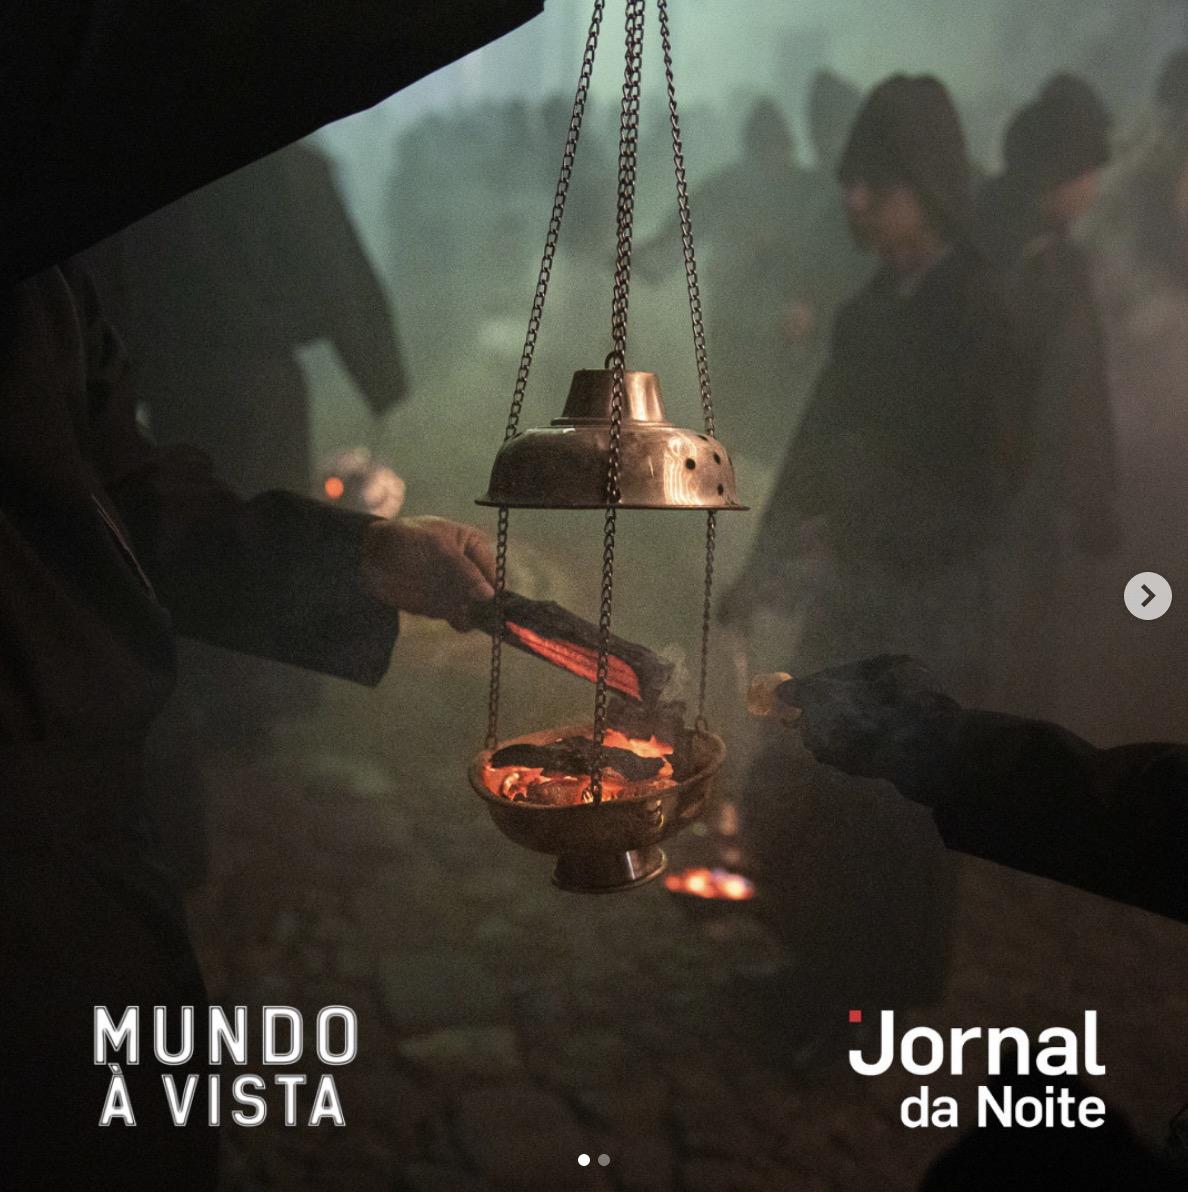 Mundo-a-vista-joel-santos-jornal-da-noite-sic-noticias-guatemala-semana-santa.jpg